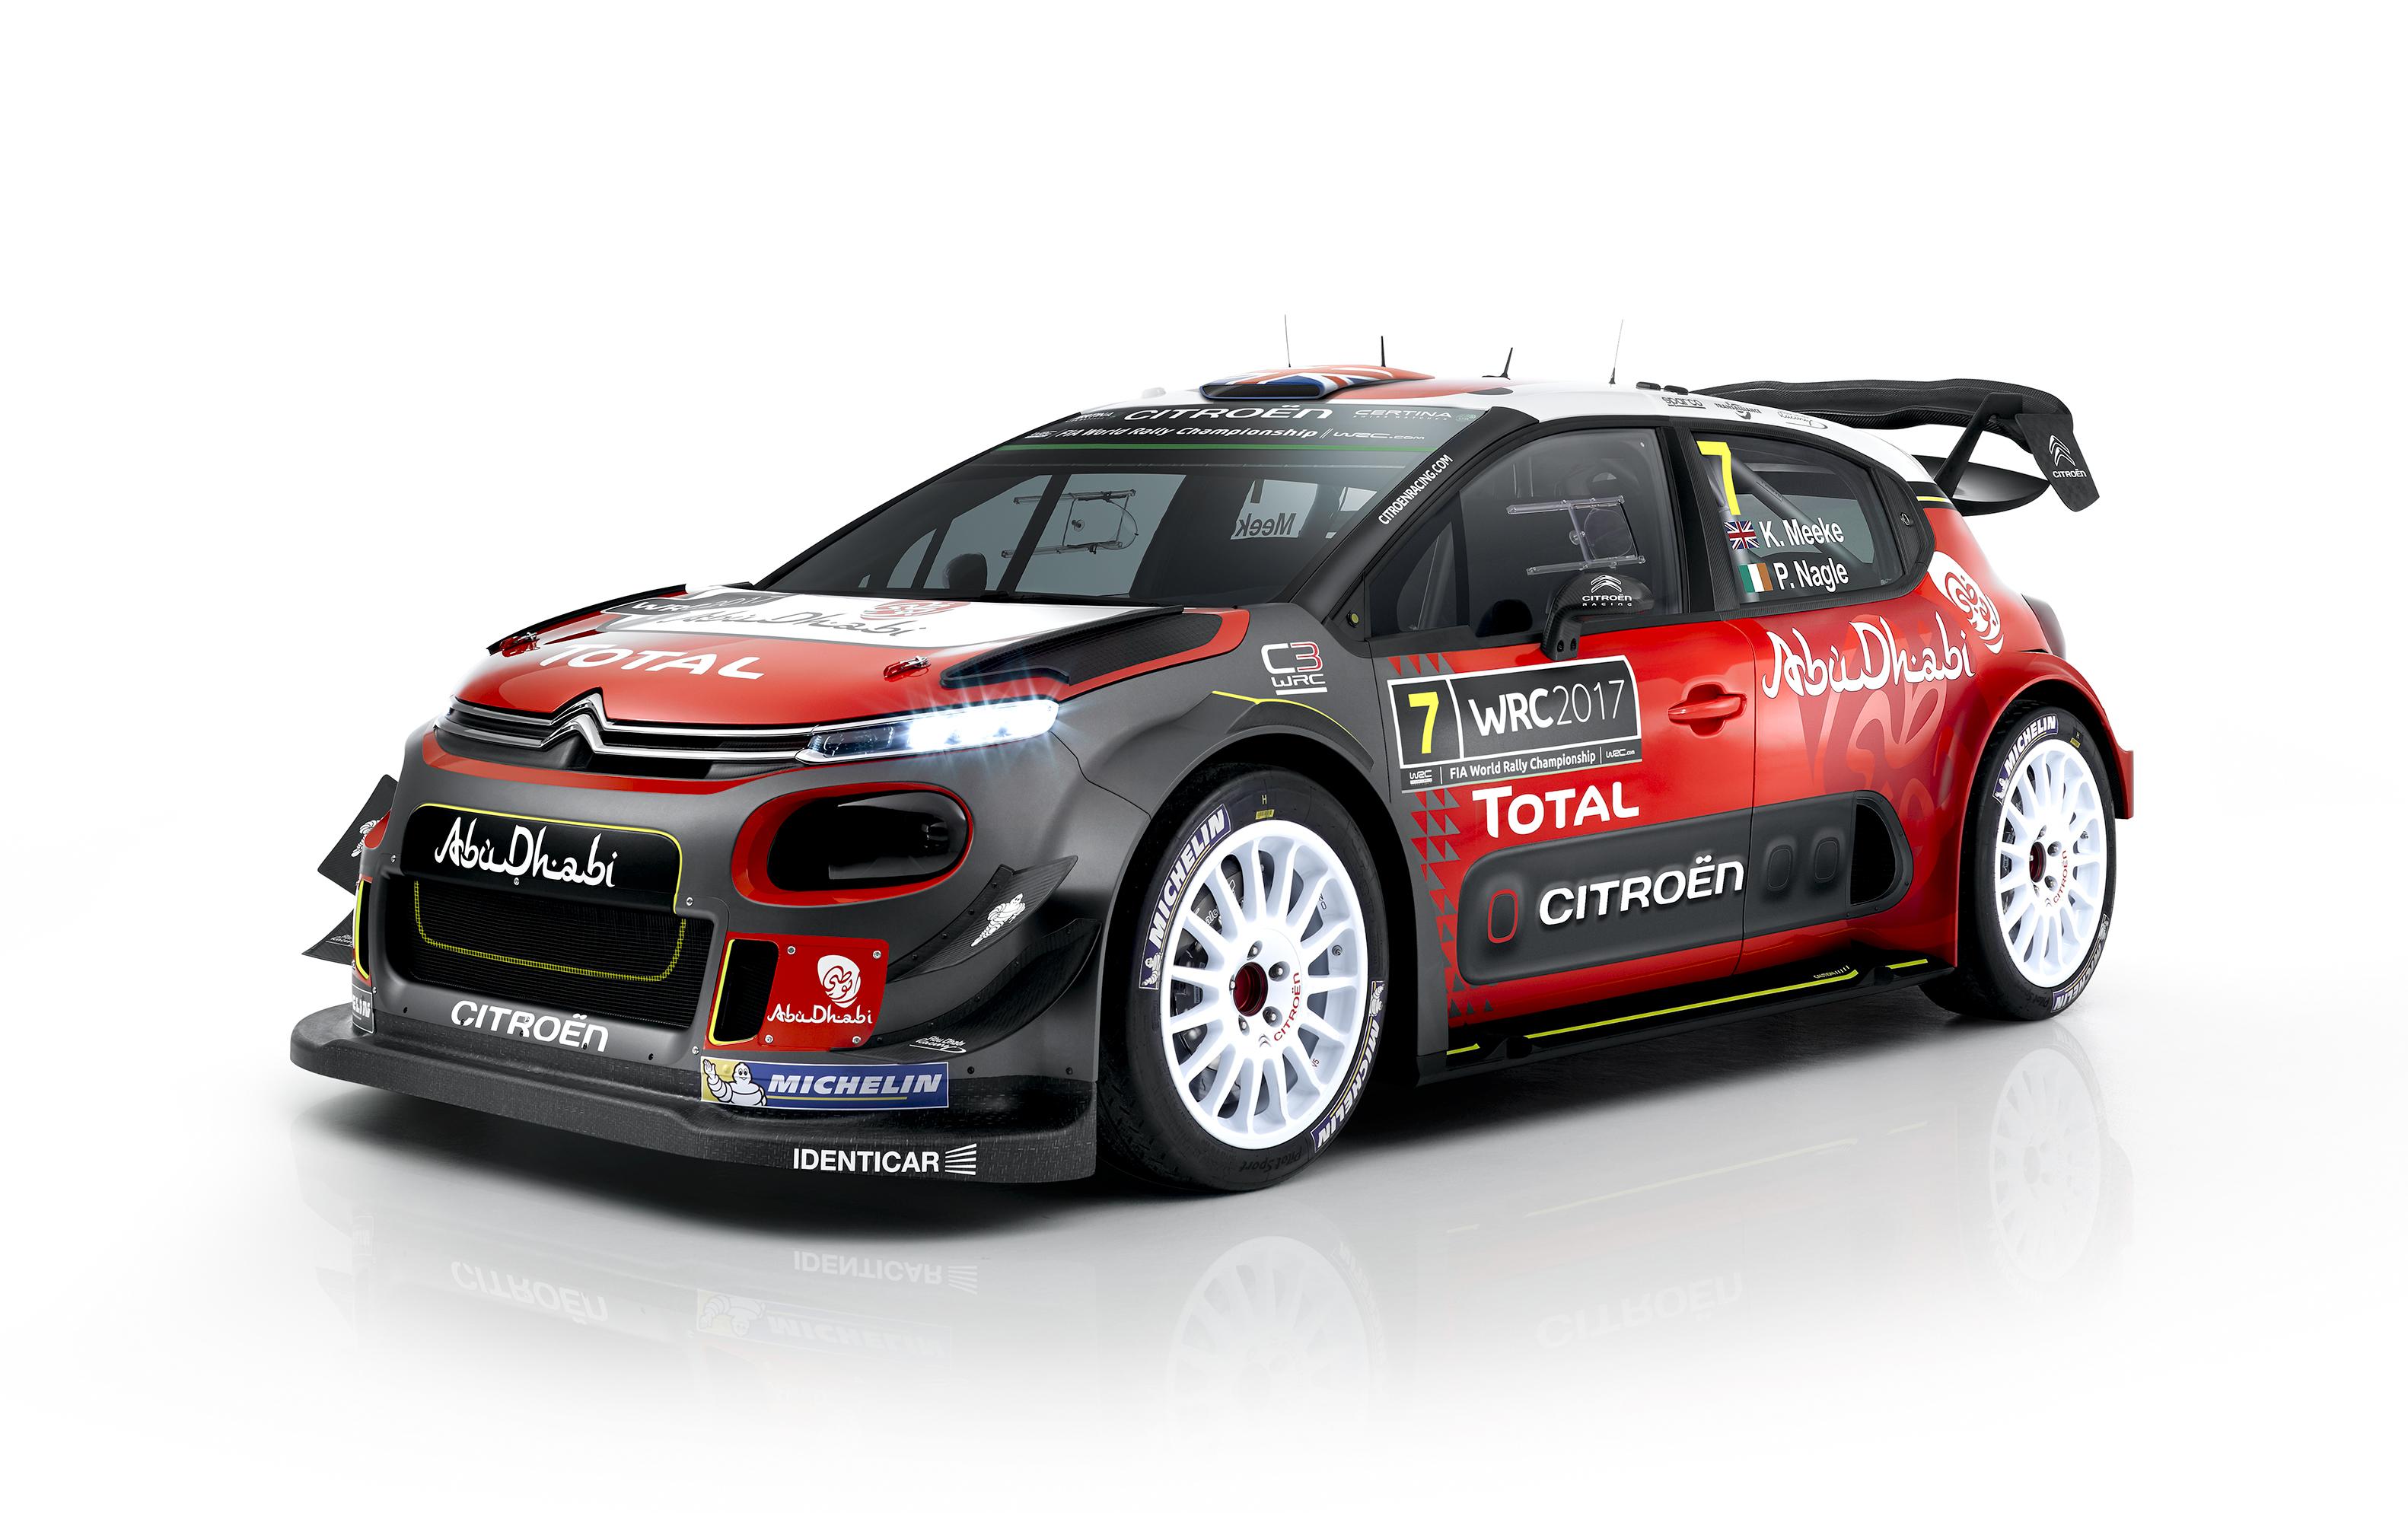 File:Citroën C3 WRC of Citroën World Rally Team jpg - Wikimedia Commons